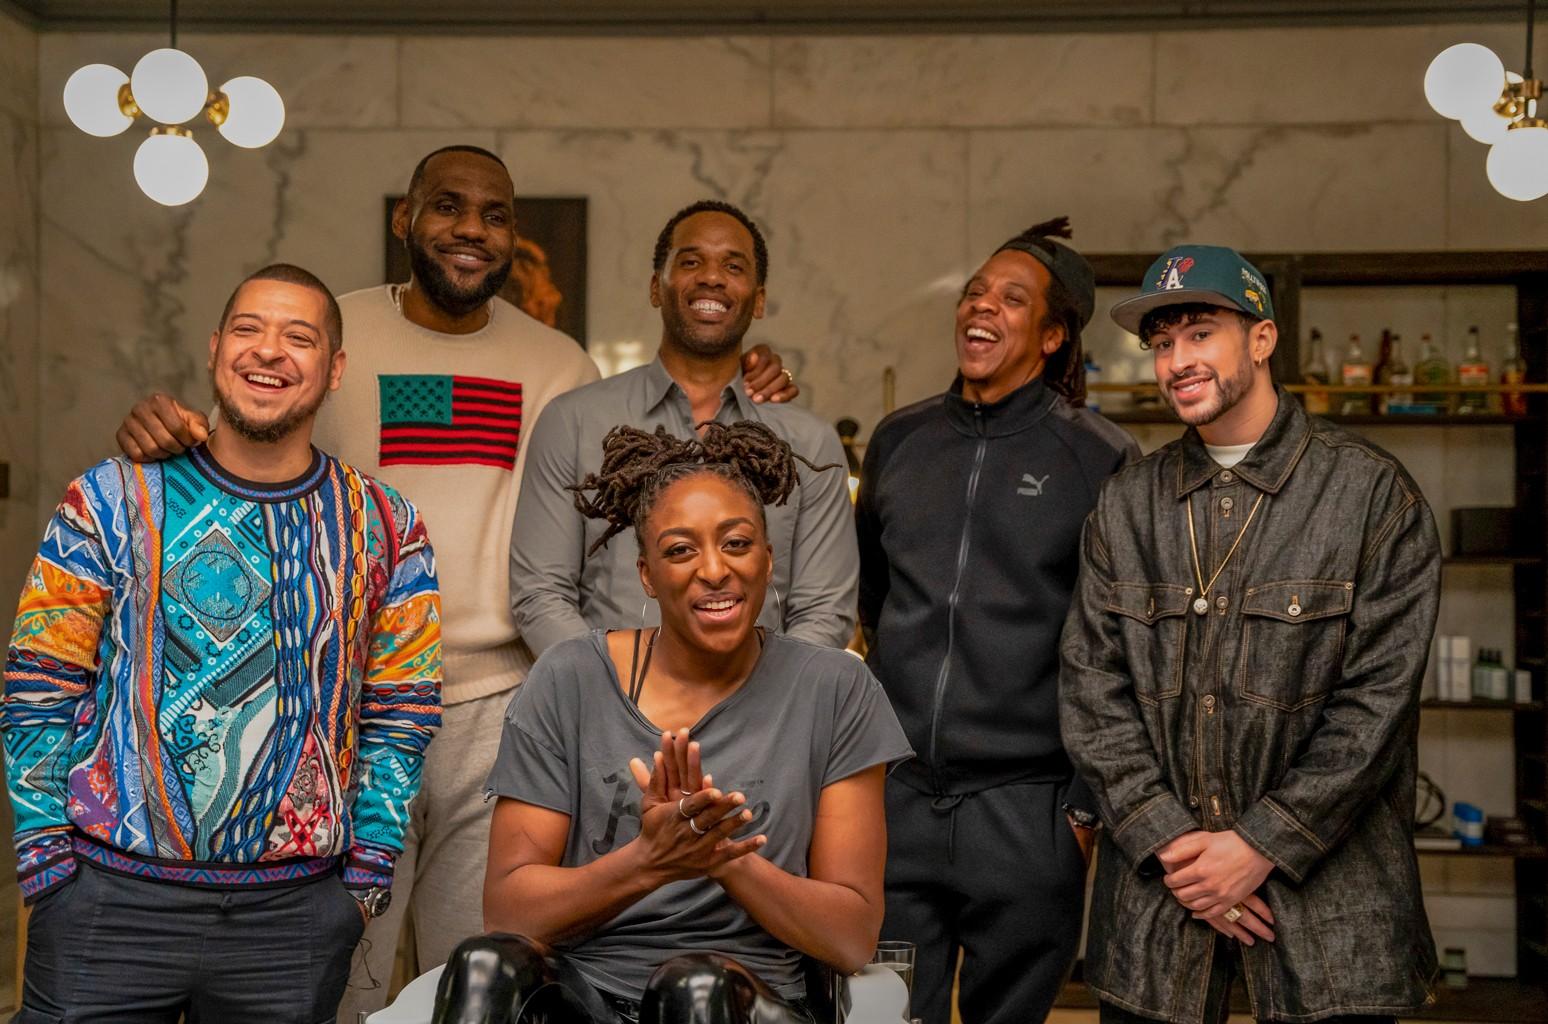 Paul Rivera, LeBron James, Maverick Carter, Nneka Ogwumike, Jay-Z, Bad Bunny